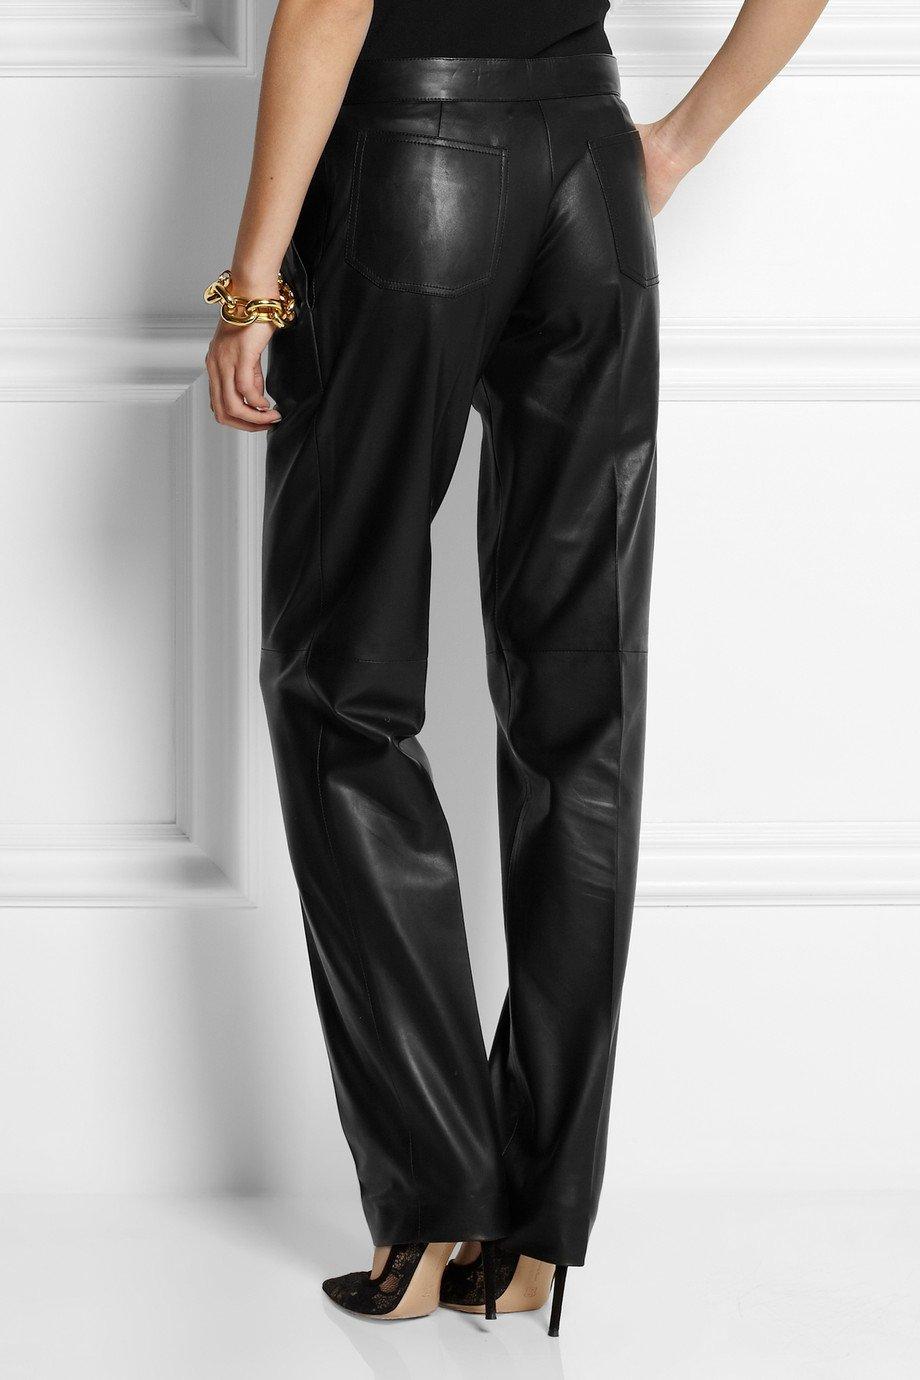 Brilliant Balmain Leather Motocrossstyle Skinny Pants In Black  Lyst